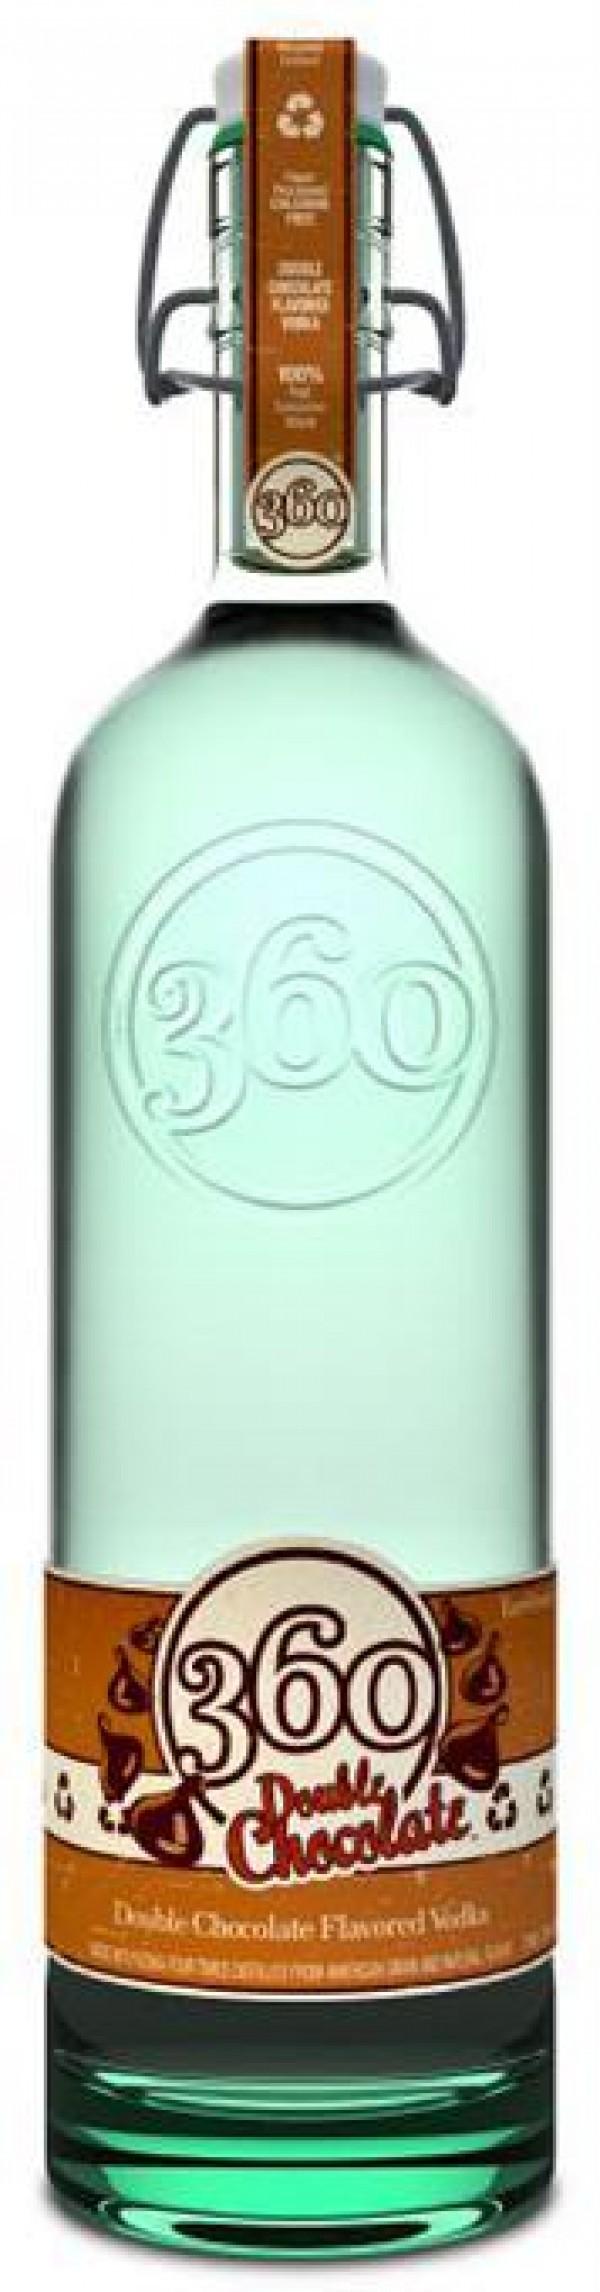 360 Vodka Double Chocolate